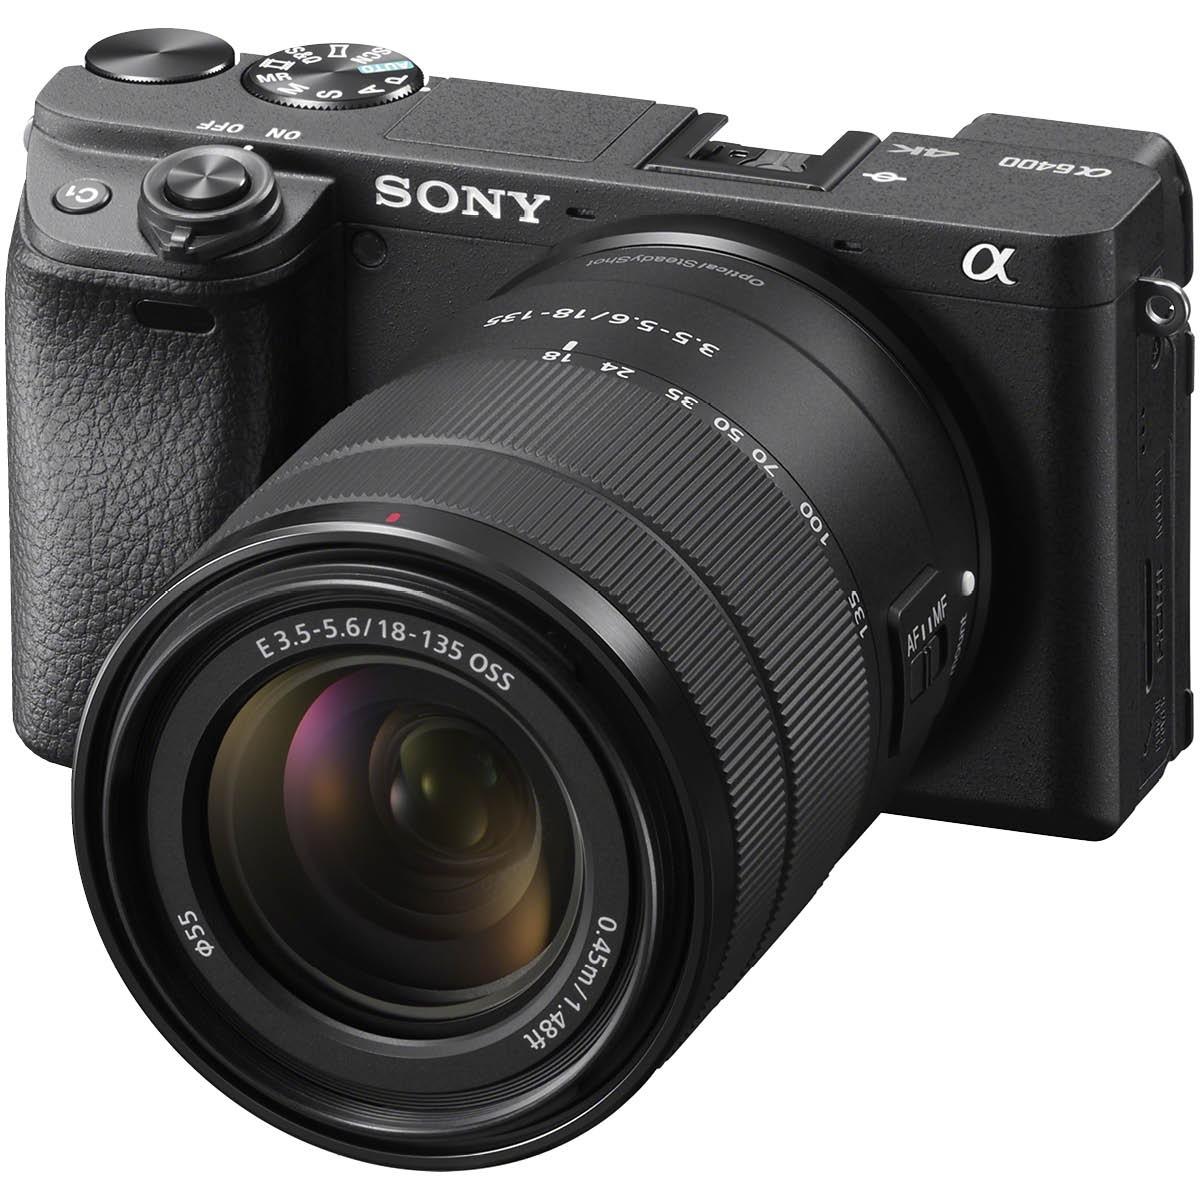 Sony Alpha 6400 Kit mit 18-135 mm 1:3,5-5,6